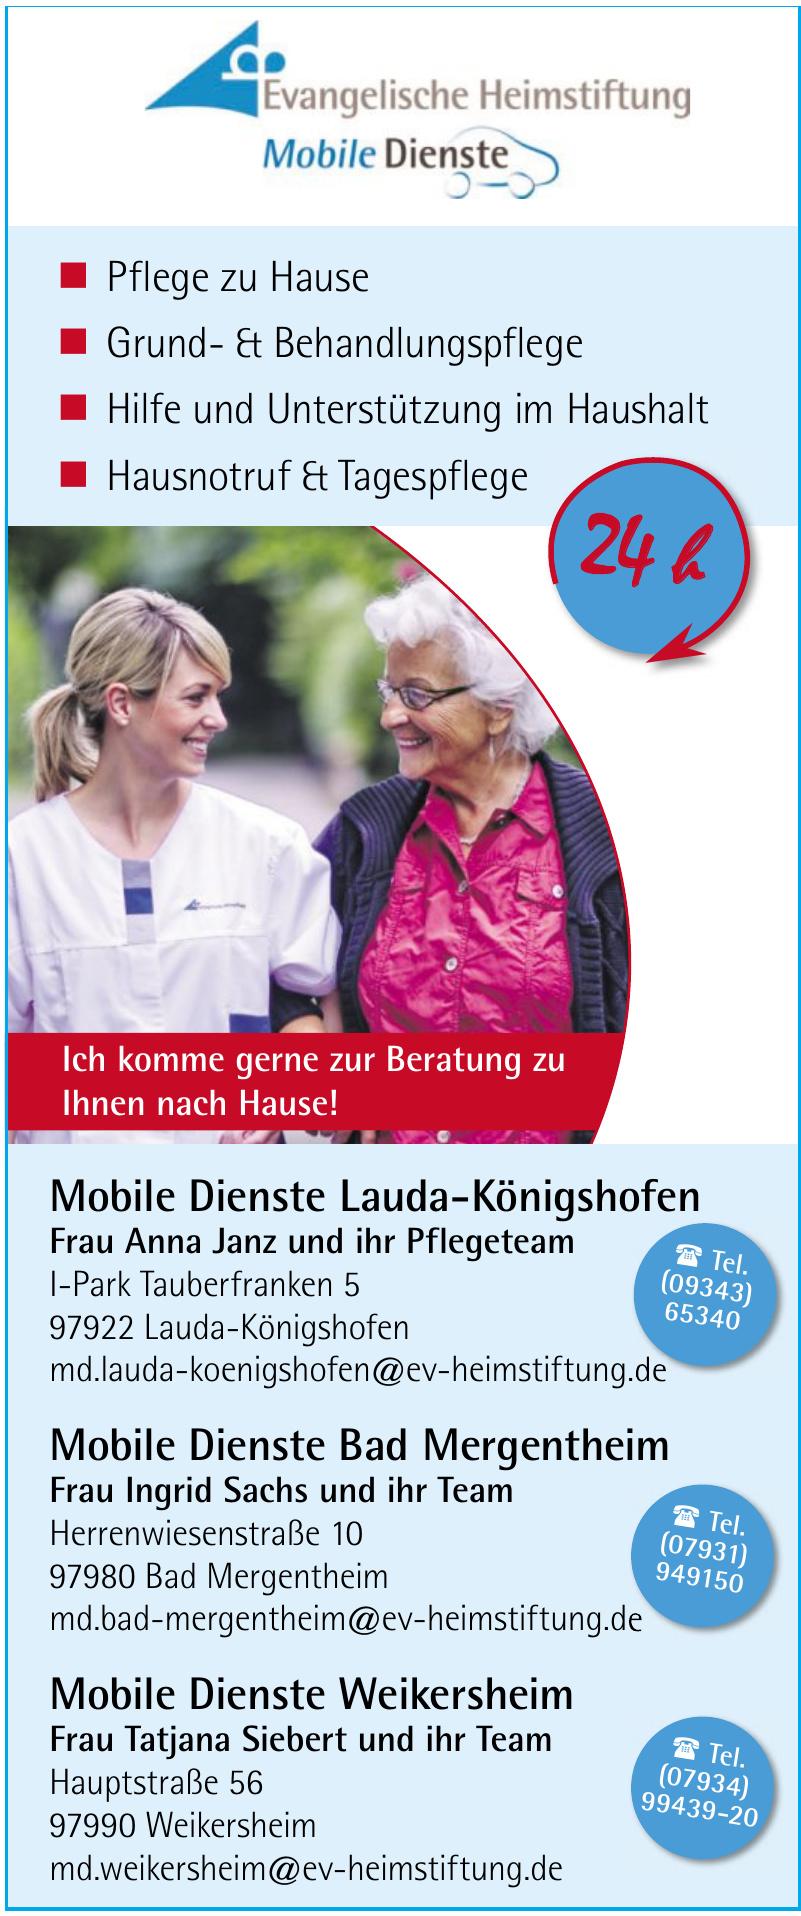 Mobile Dienste Lauda-Königshofen